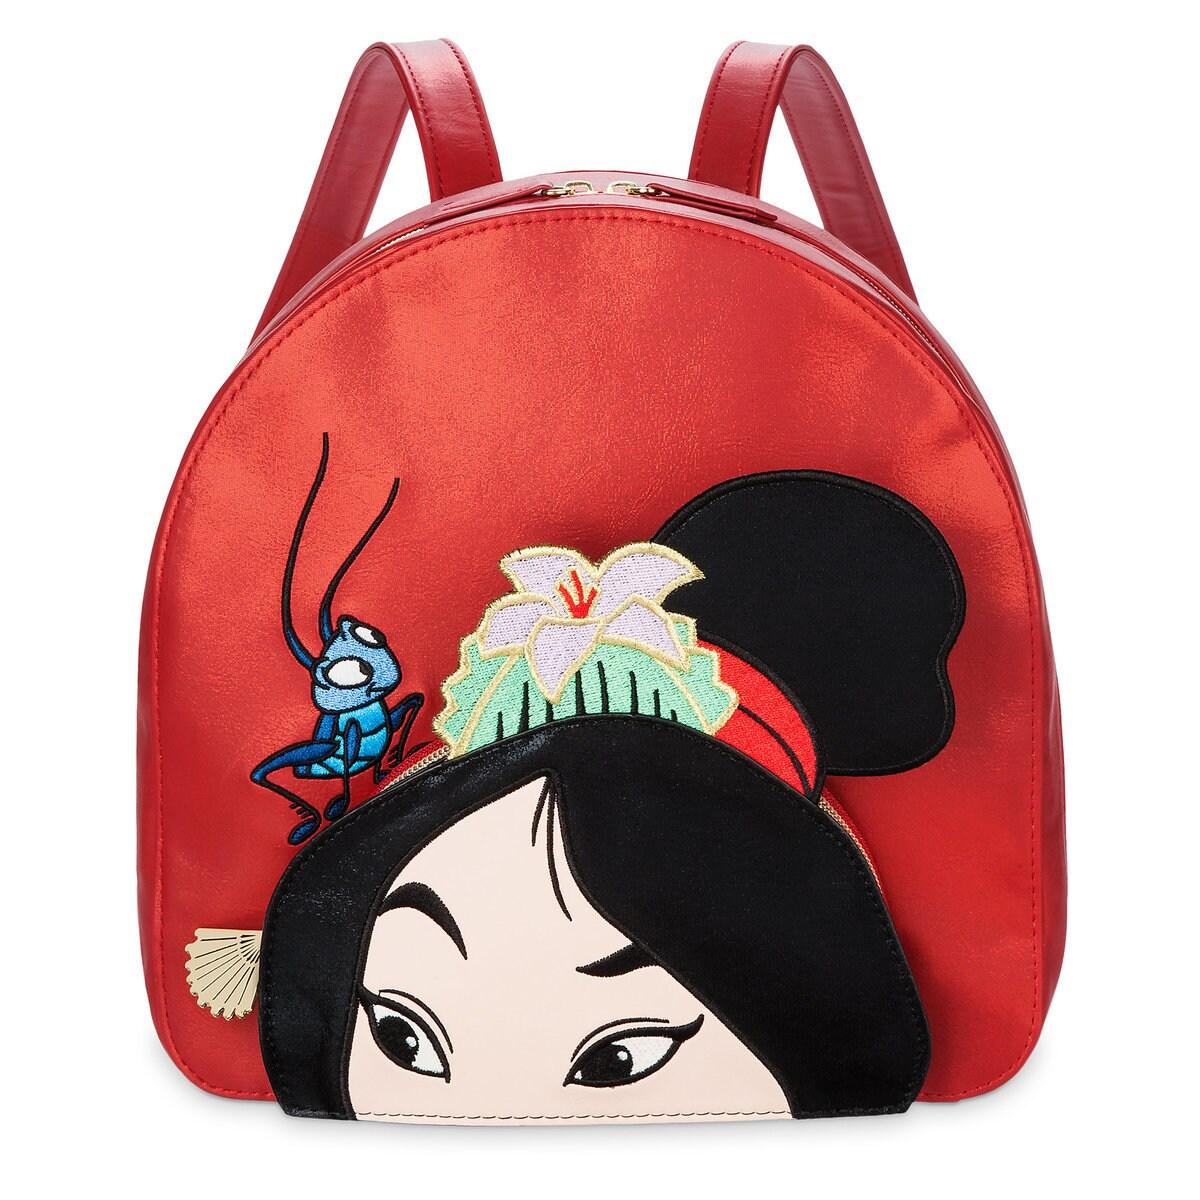 e1959e9be1c Product Image of Mulan Fashion Backpack by Danielle Nicole   1